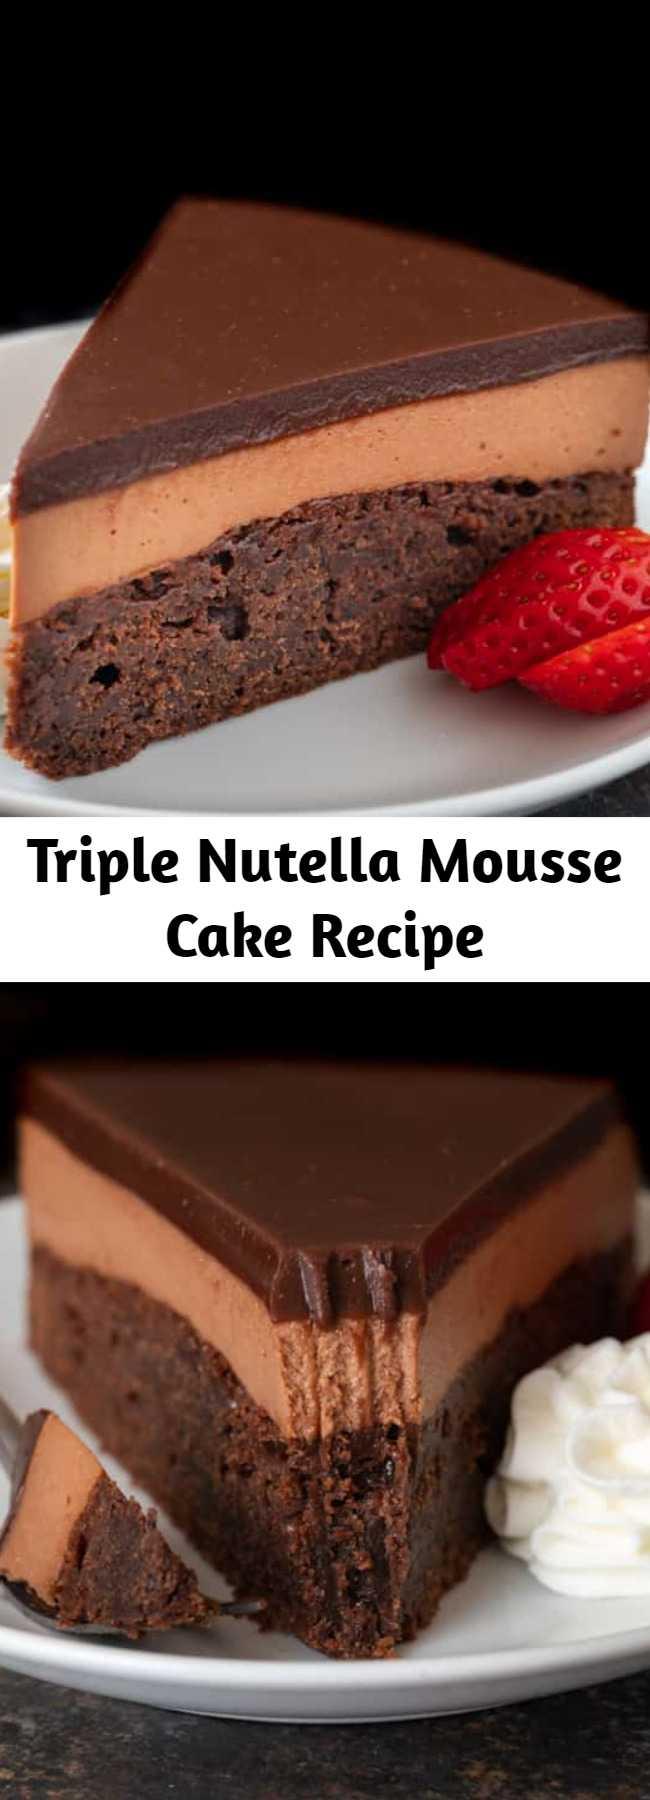 Triple Nutella Mousse Cake Recipe